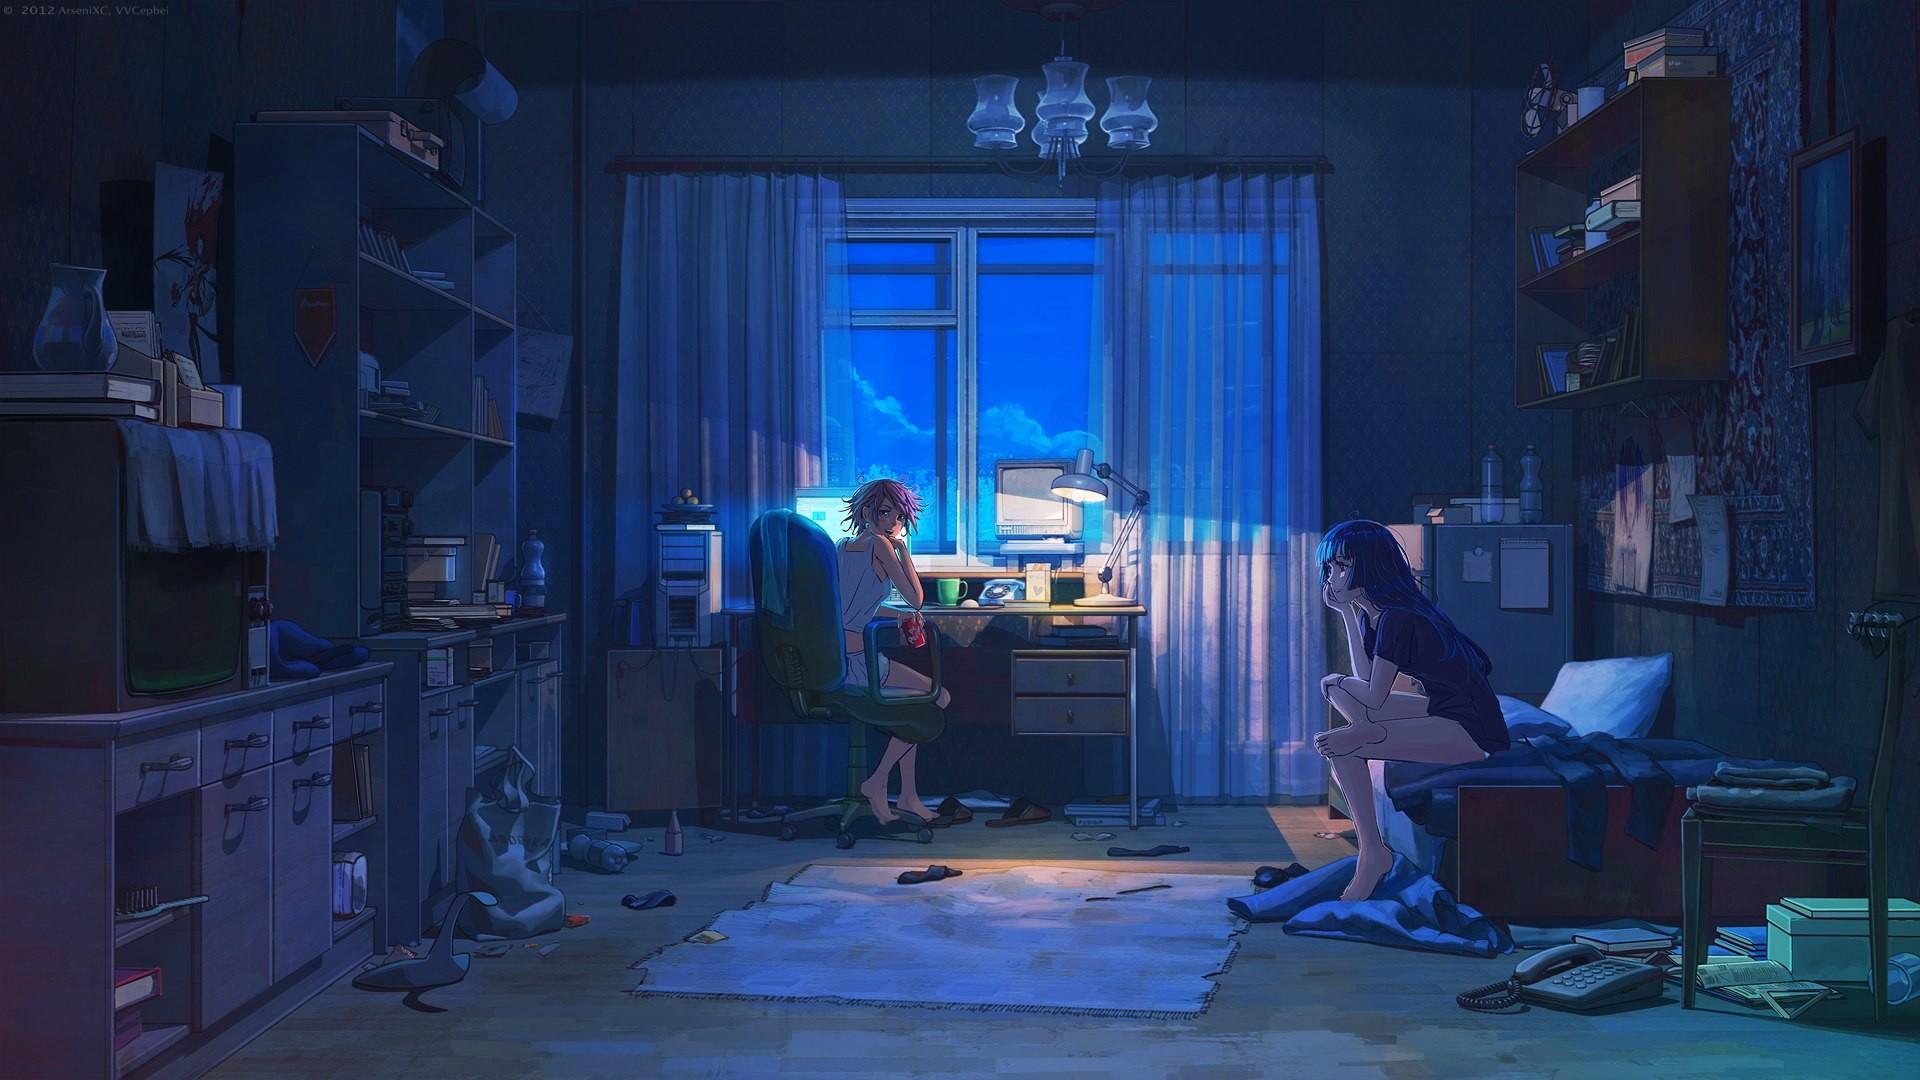 Bedroom House Anime Scenery Background Wallpaper